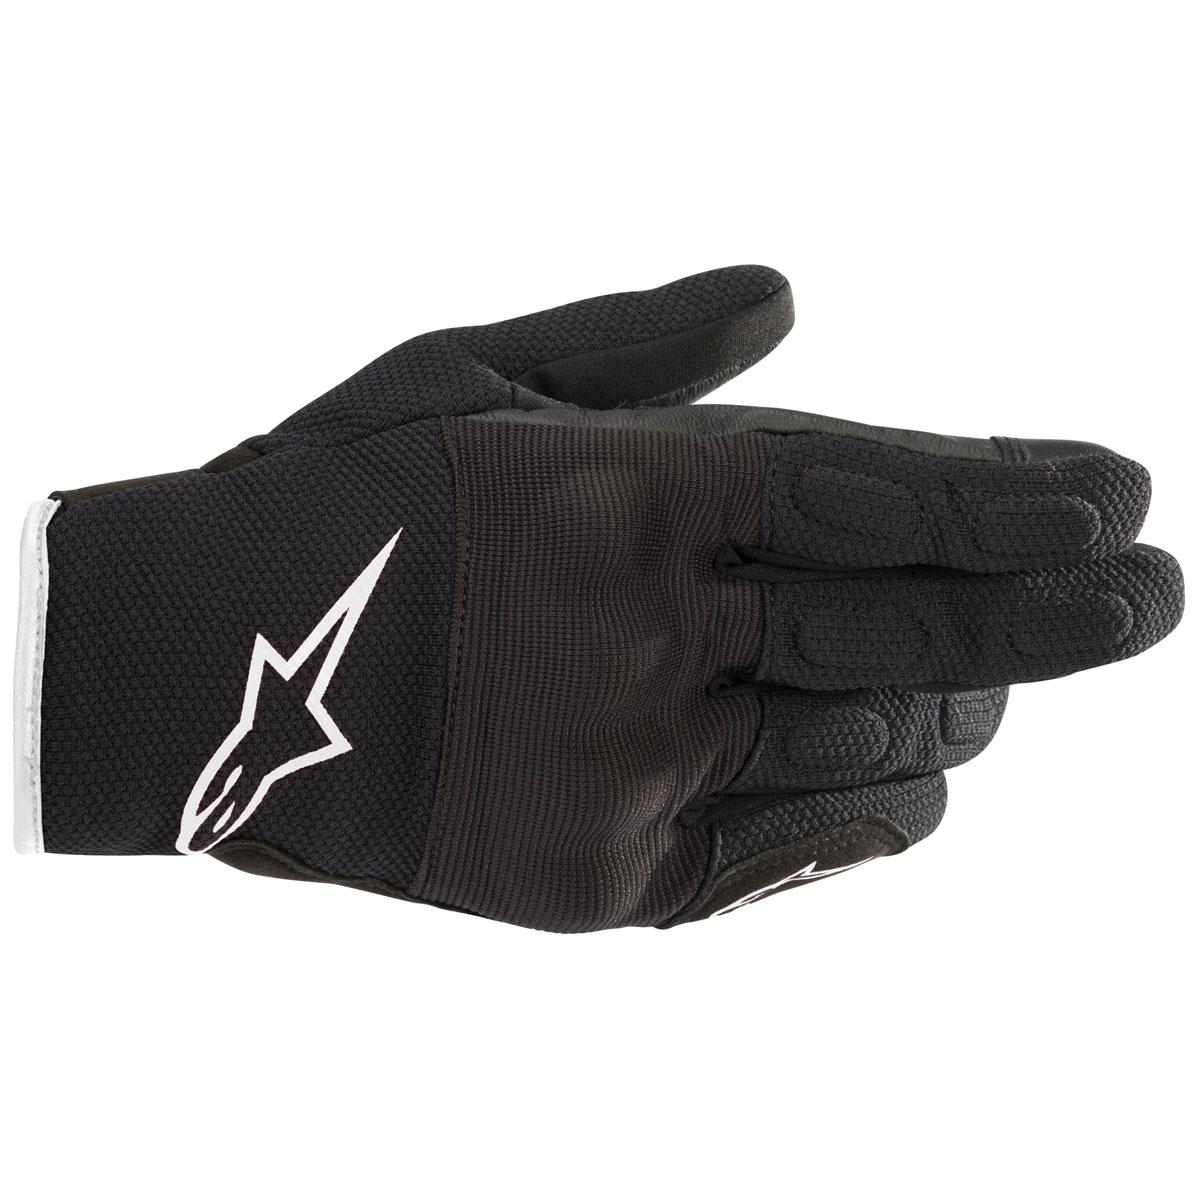 Alpinestars Women's Stella S-Max Drystar Black/White Gloves